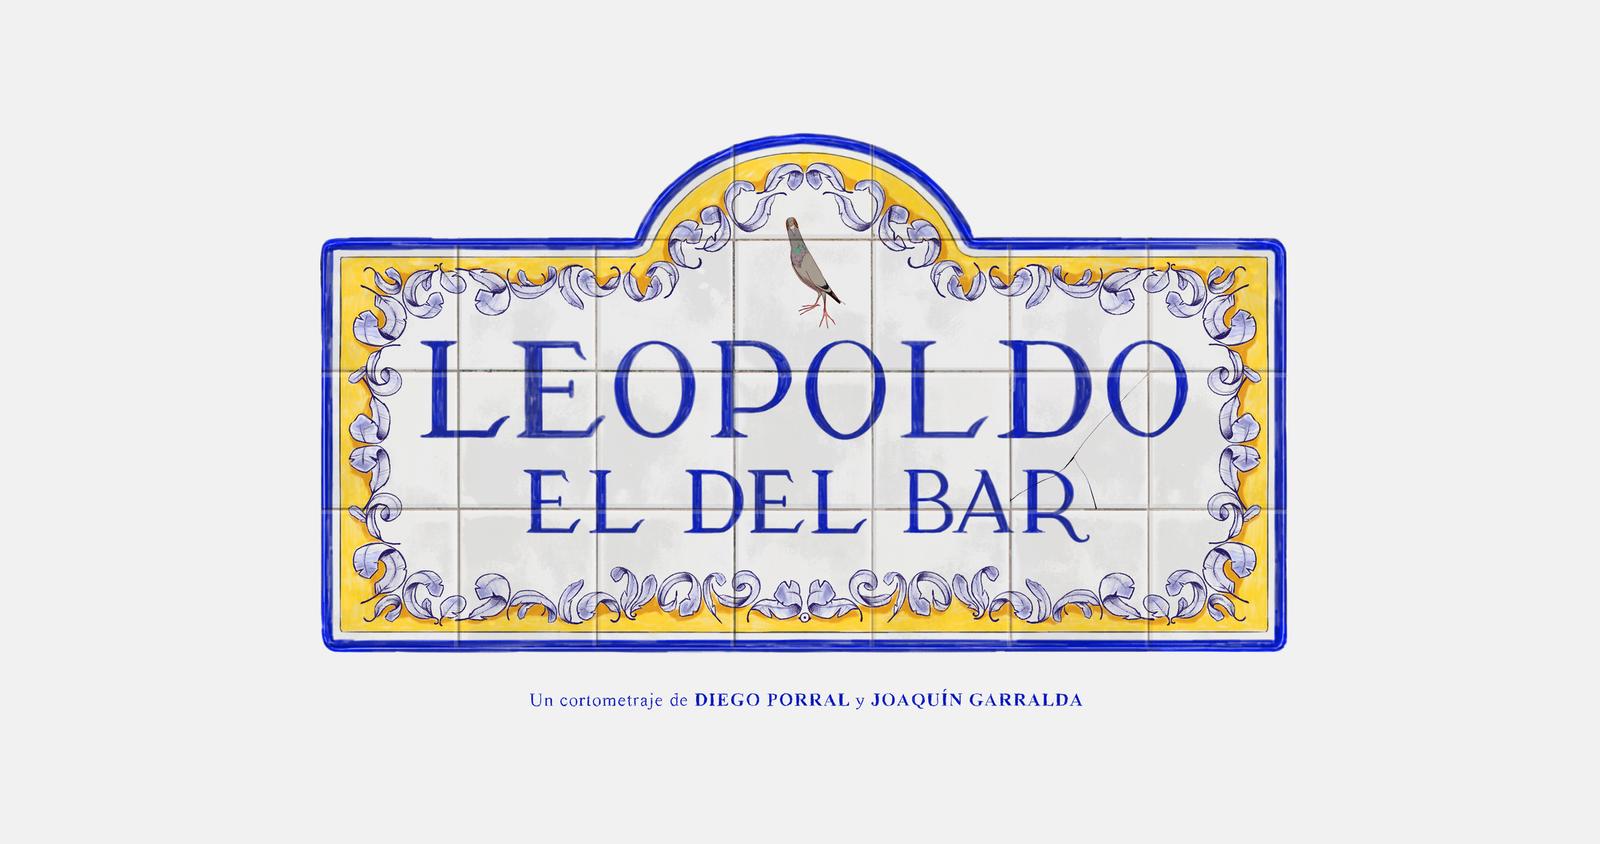 Leopoldo el del bar